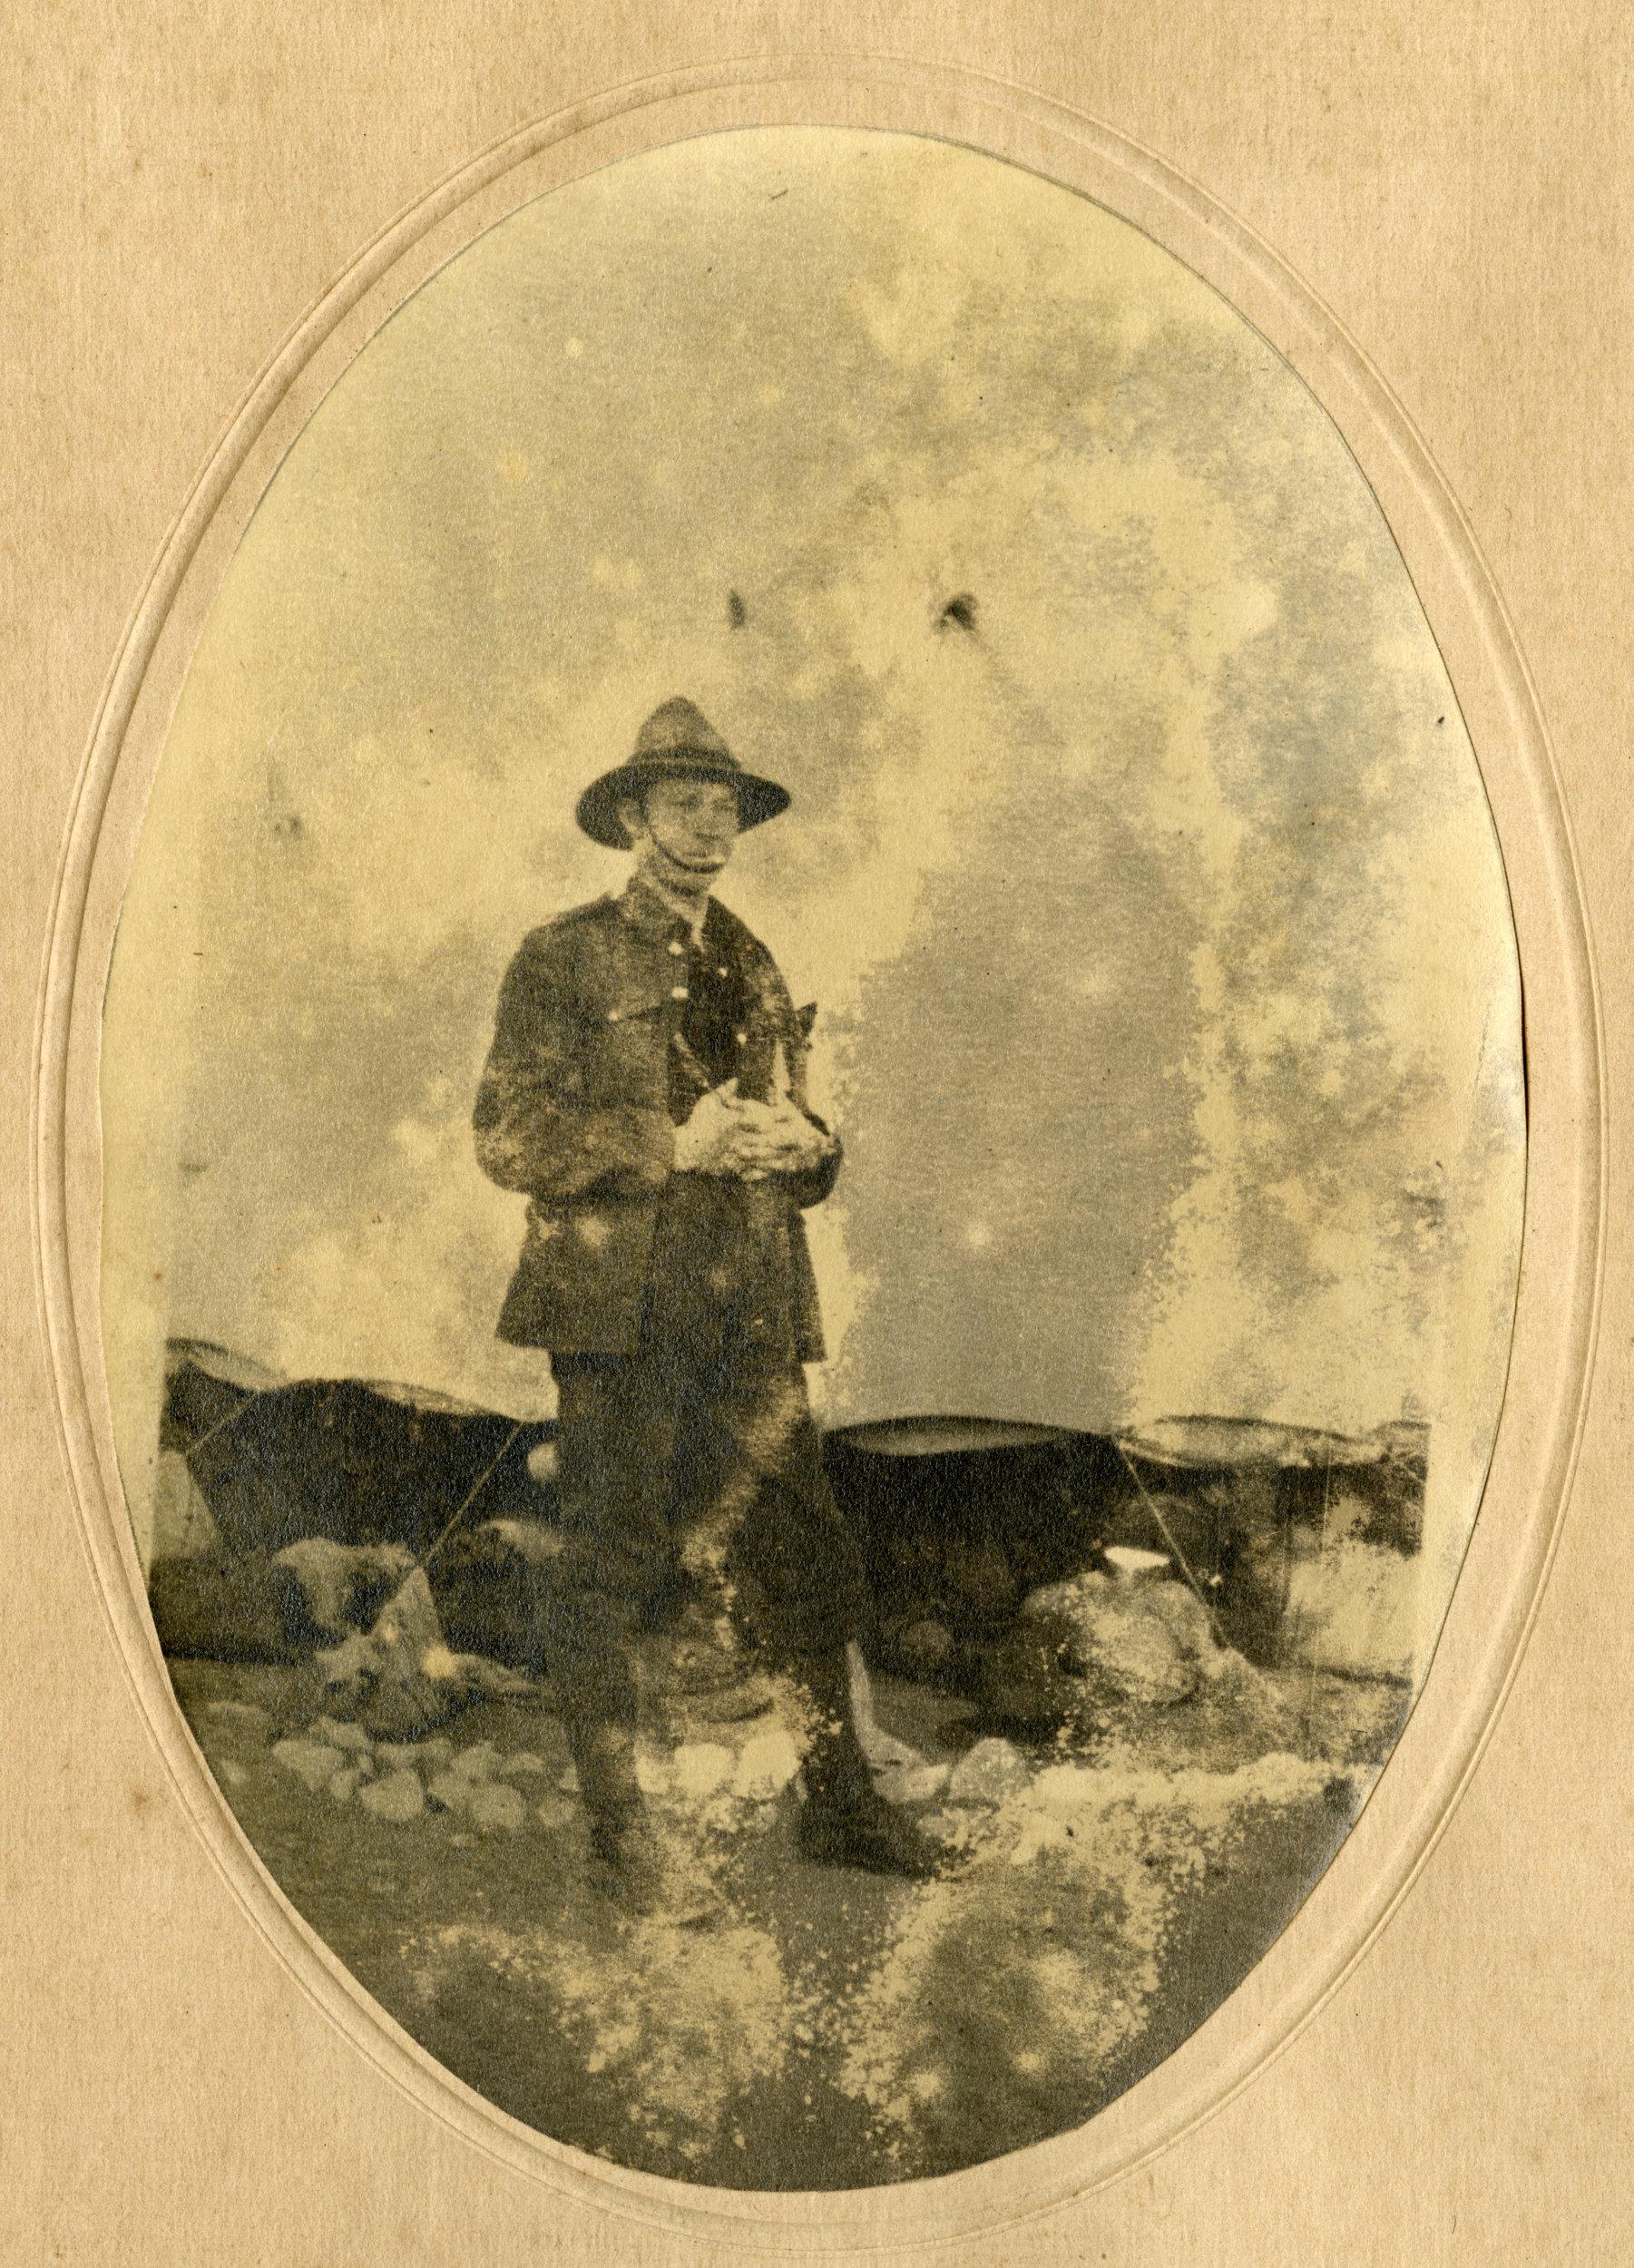 H.H. Mackrell in Egypt, prior to Gallipoli